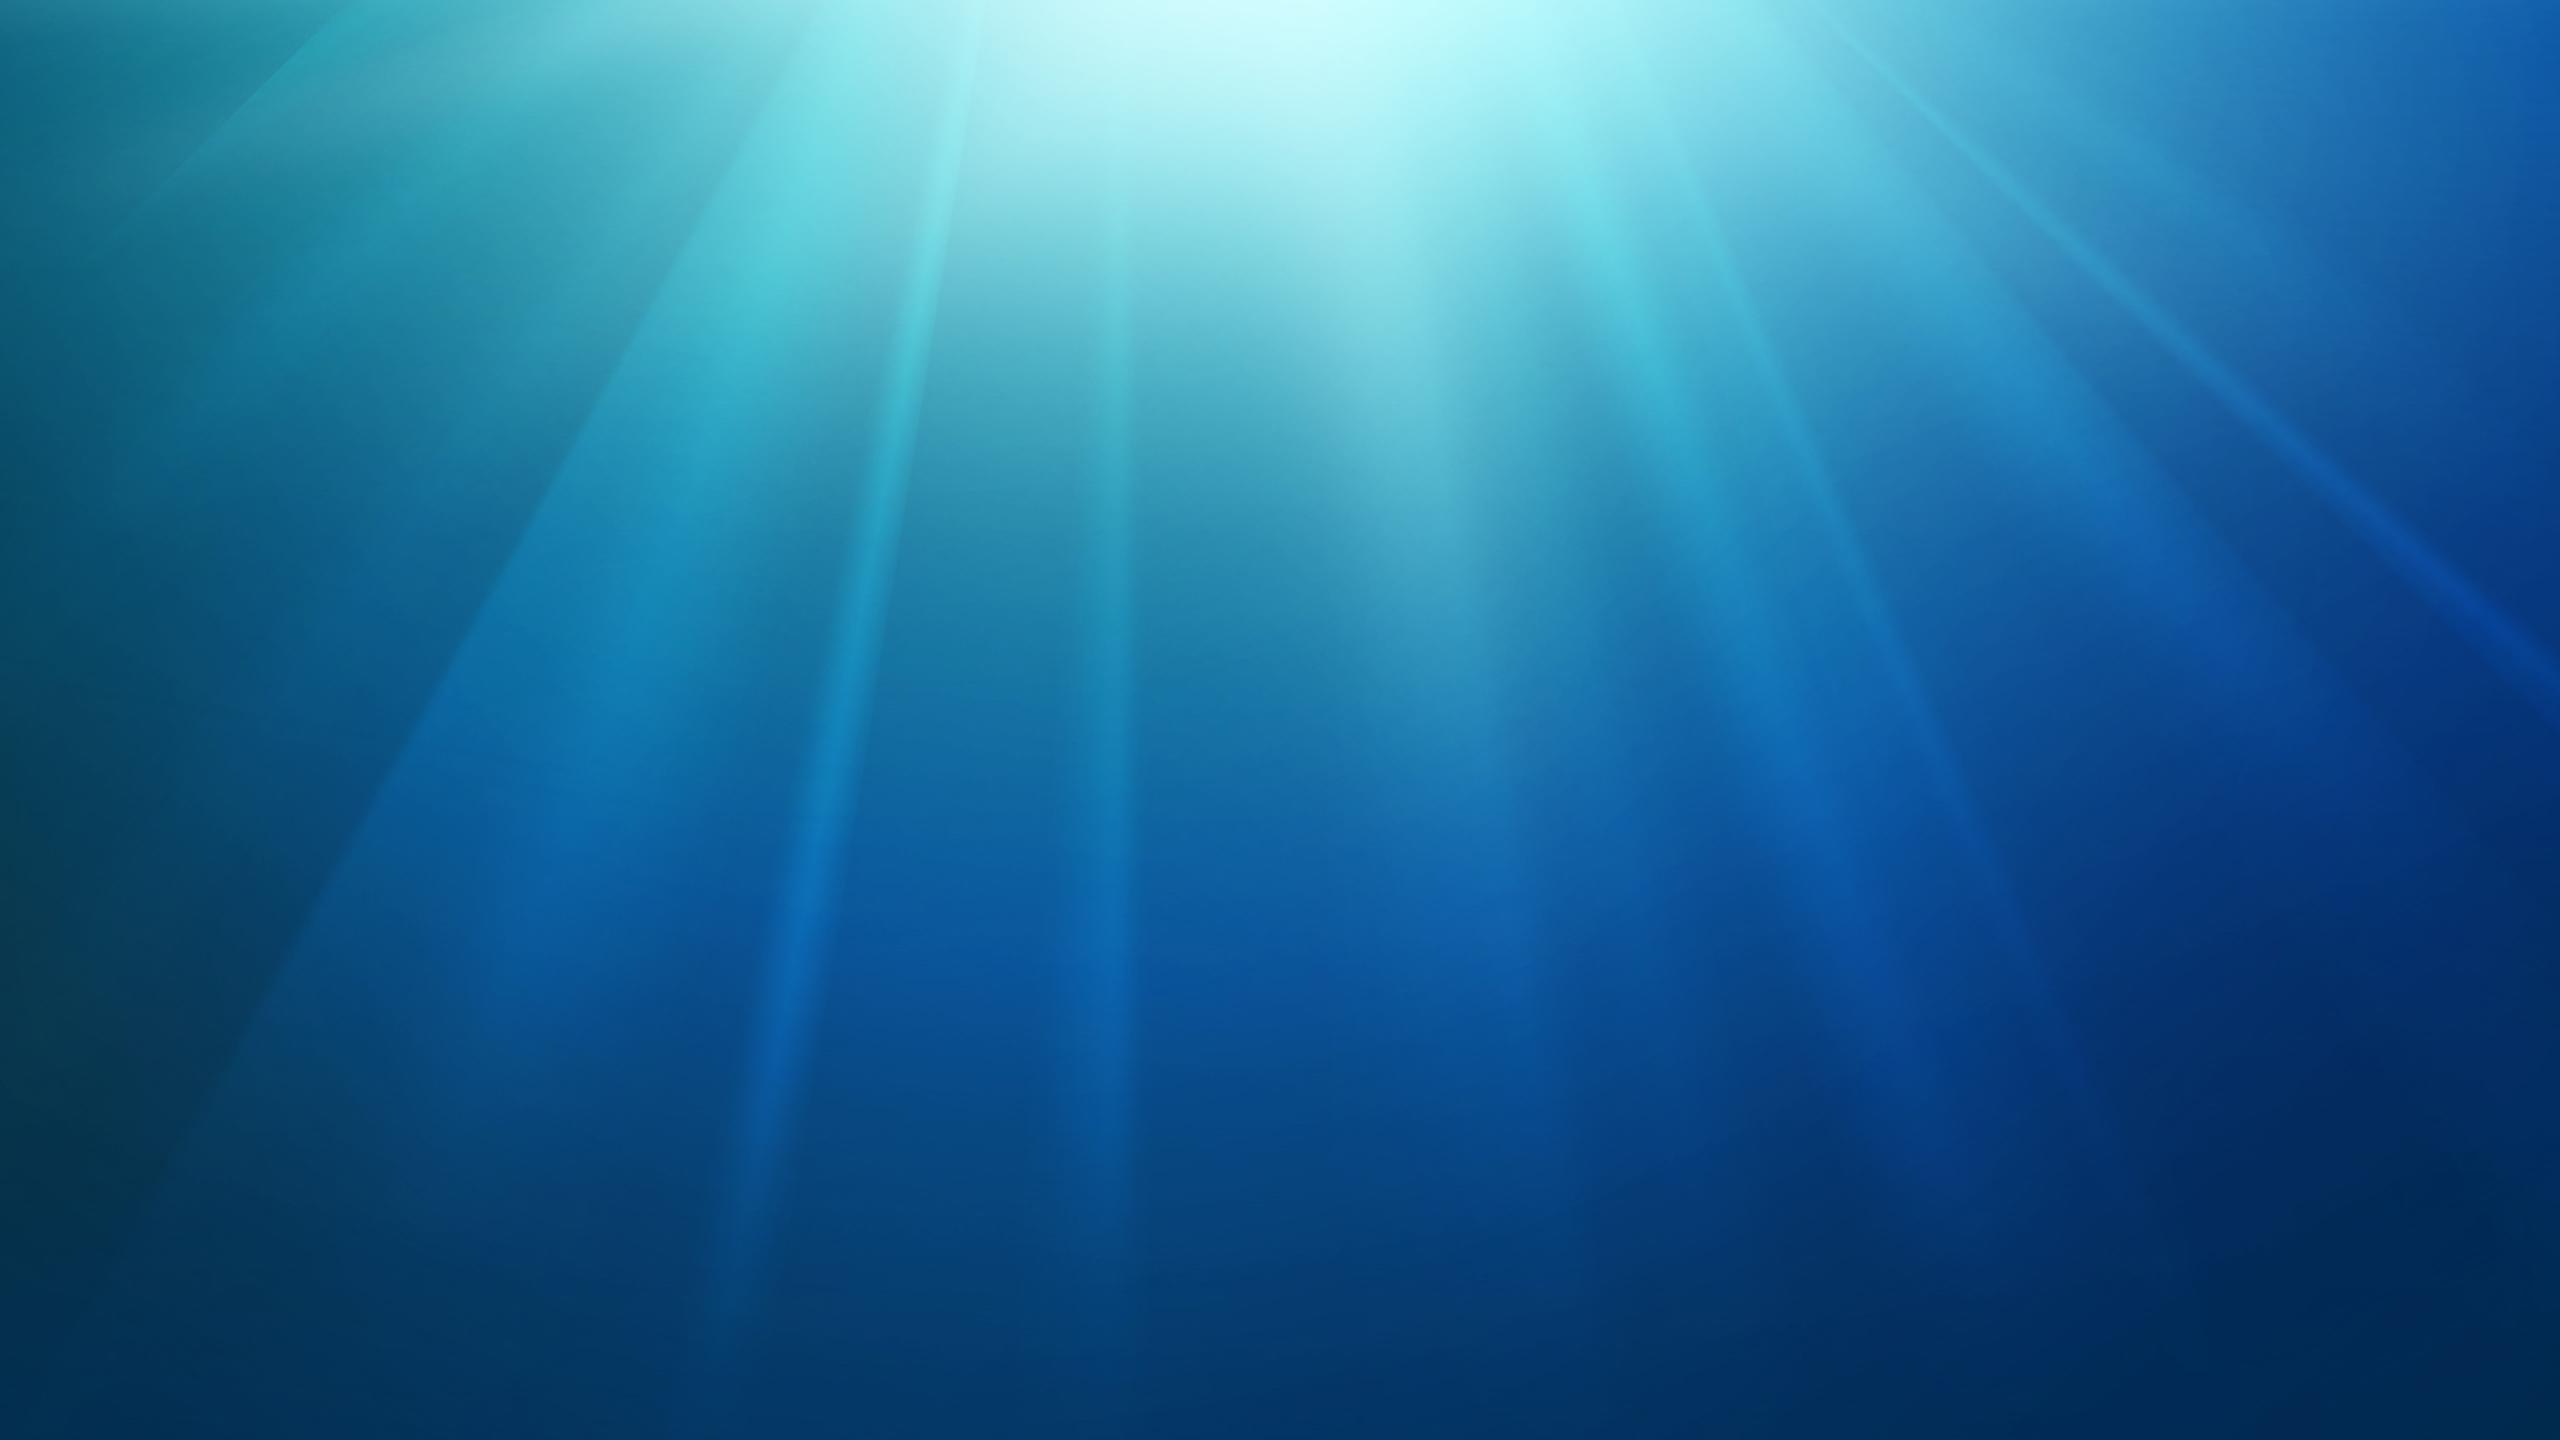 blue wallpaper 2560x1440 photo blue wallpaper 2560x1440 pic blue 2560x1440